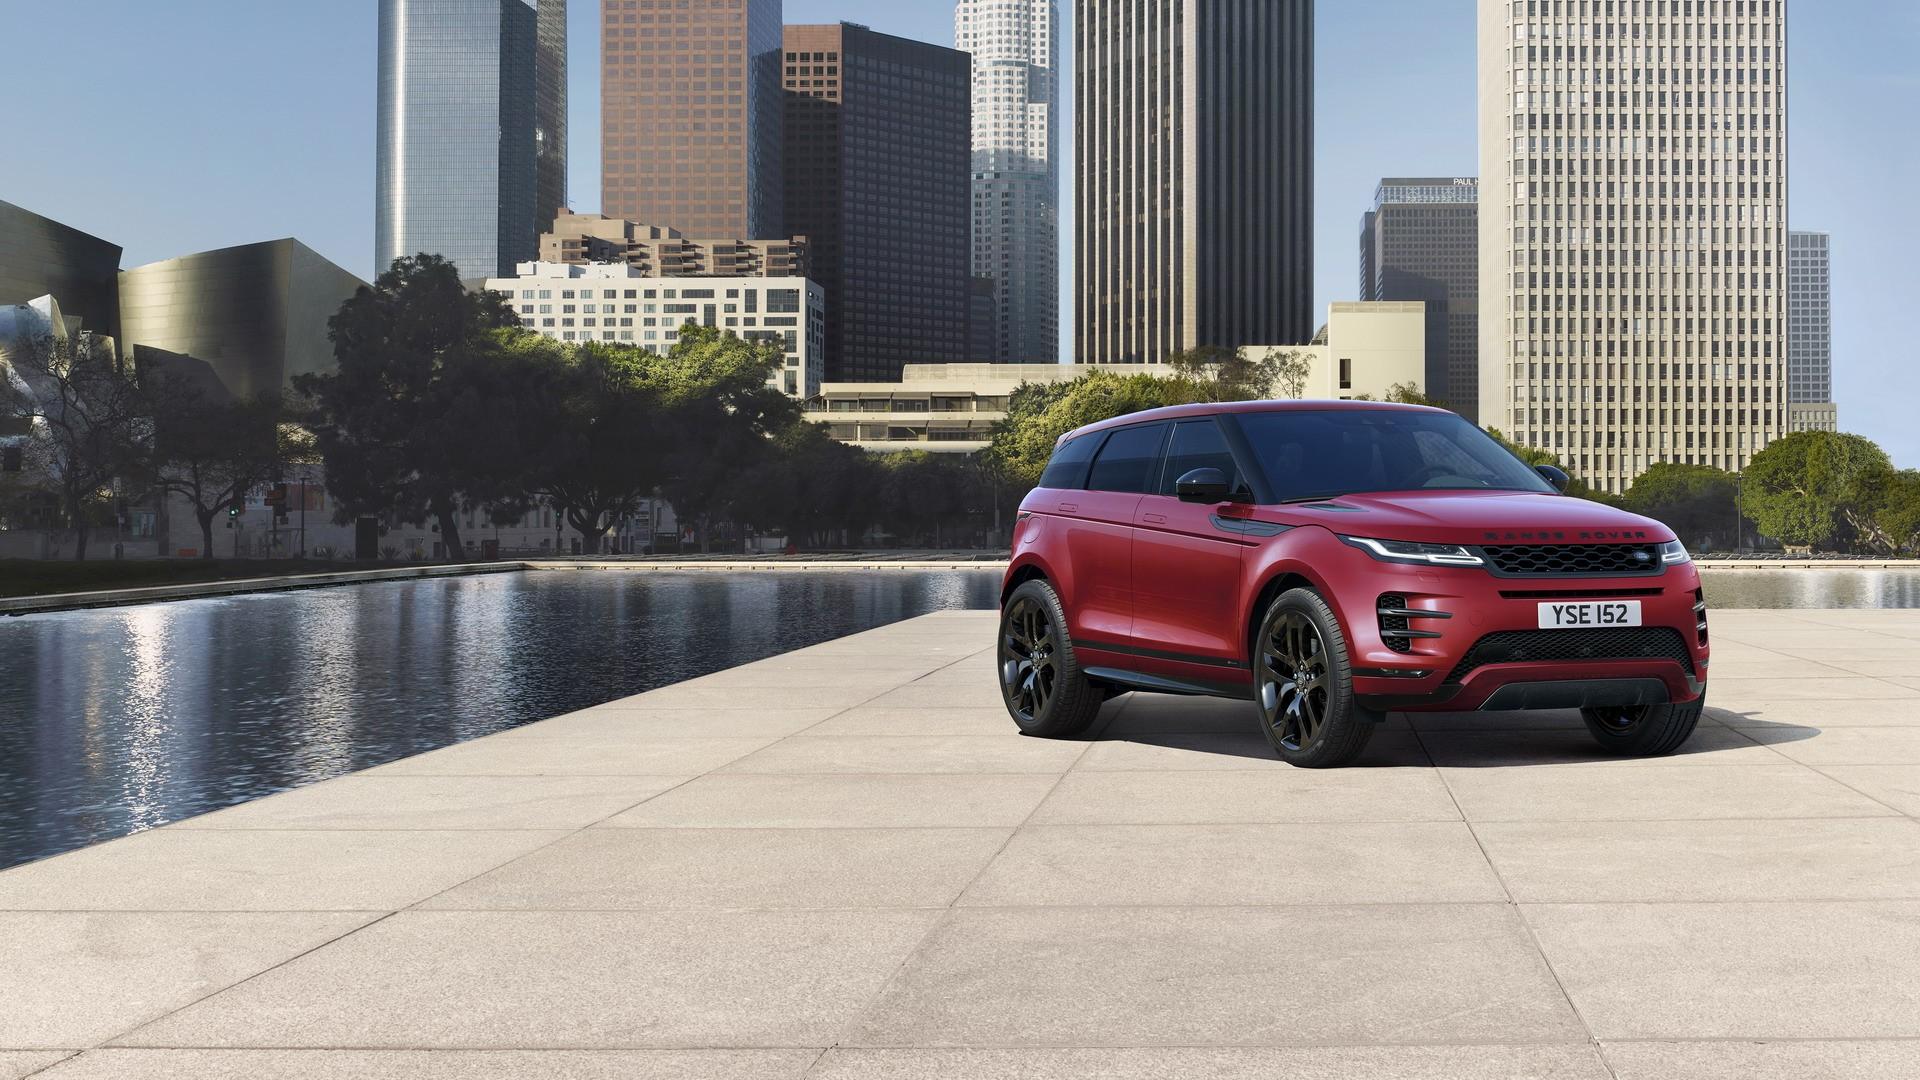 Range Rover Configurator >> Land Rover Launches Online Configurator For 2020 Range Rover Evoque - autoevolution